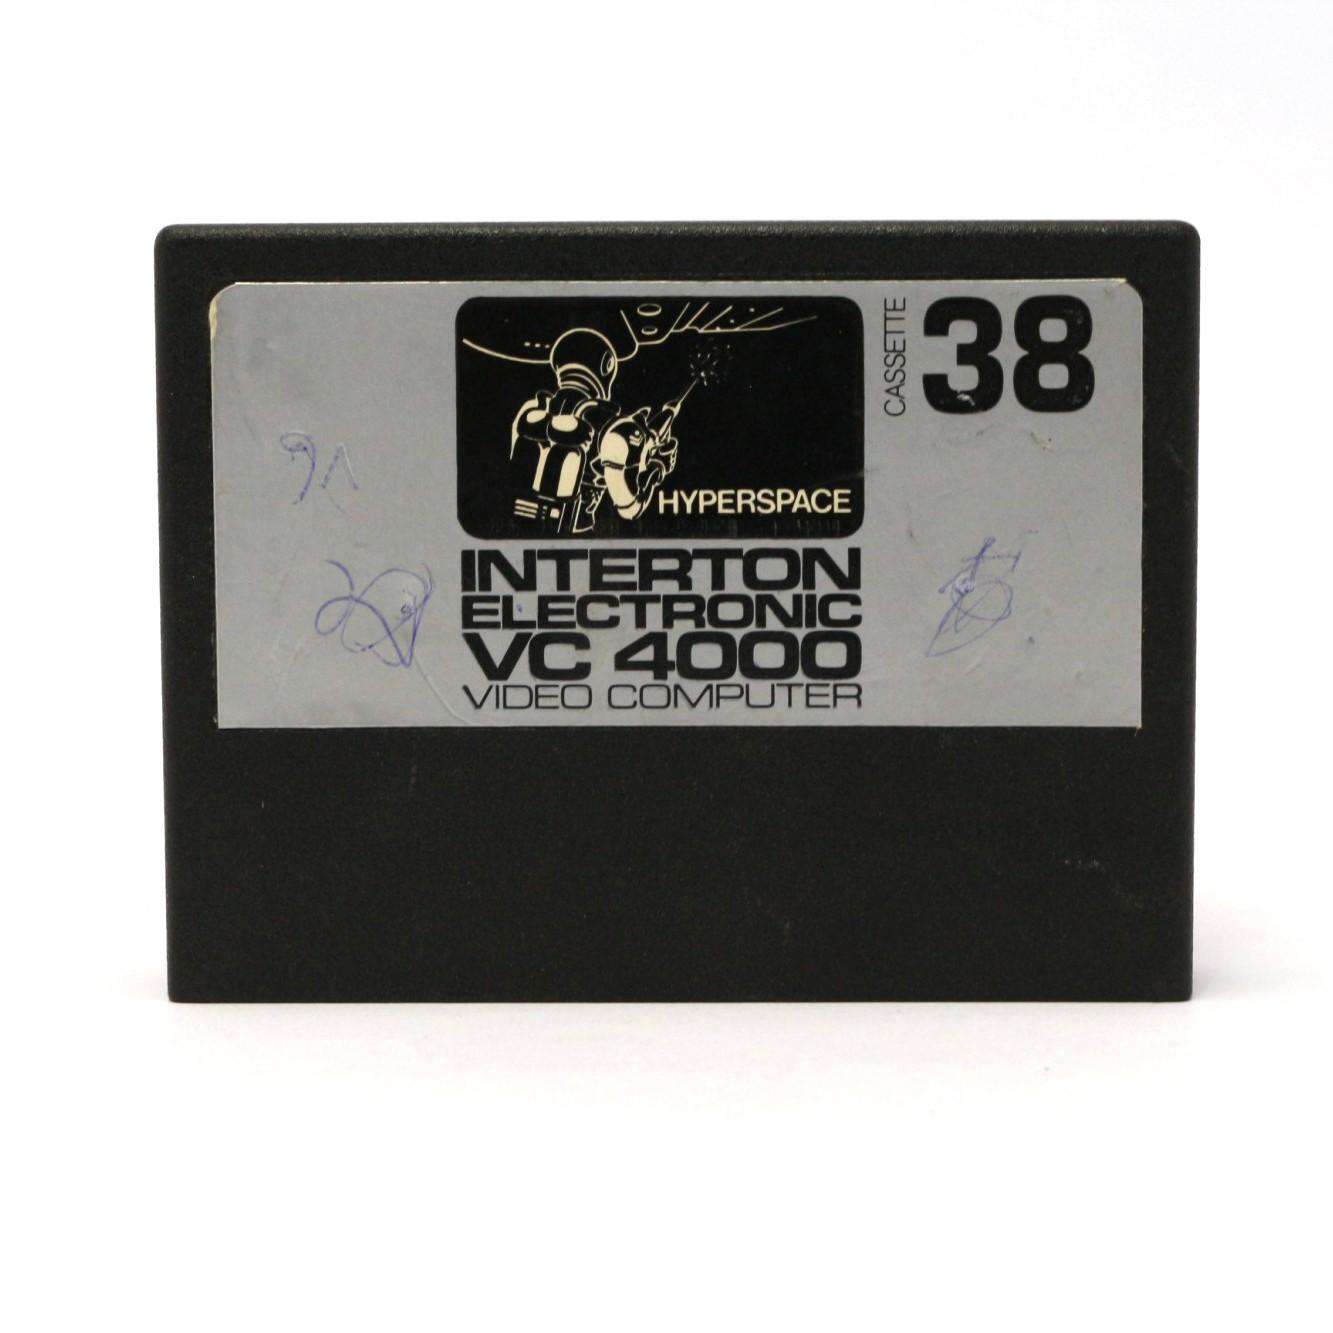 Interton VC 4000 - Cassette 38: Hyperspace